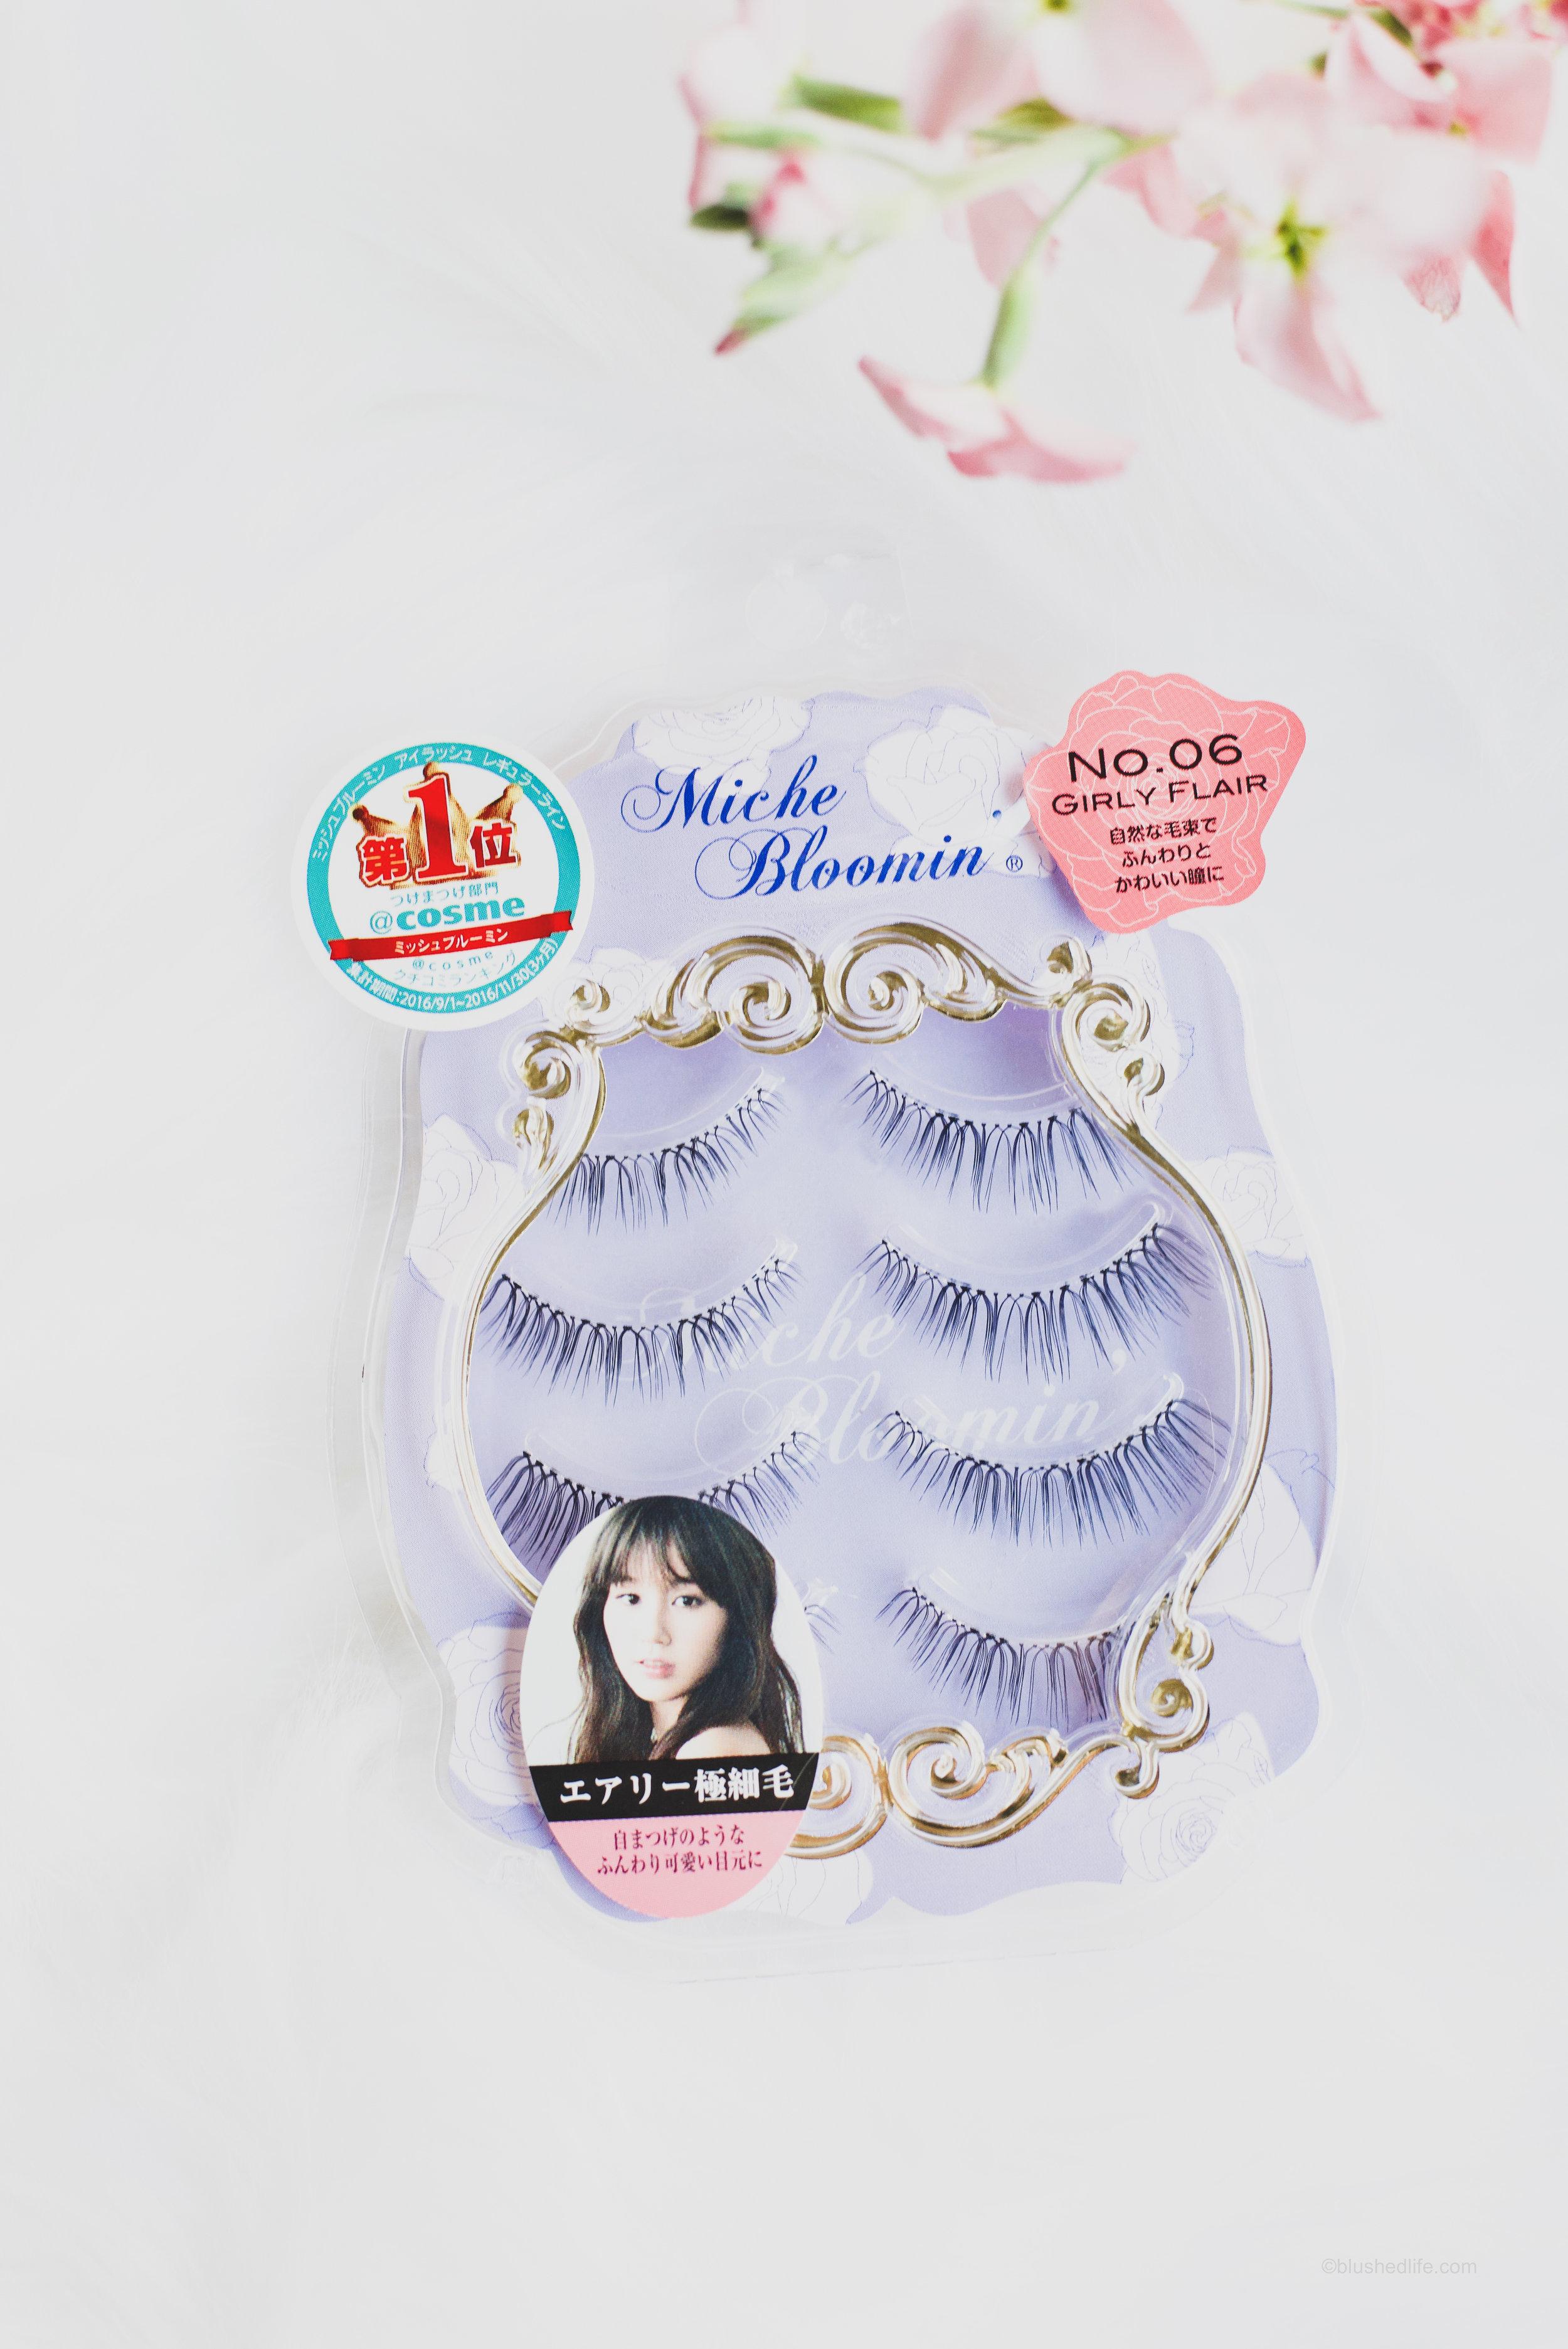 false lashes for asian eyes miche bloomin_DSC_3678-2.jpg